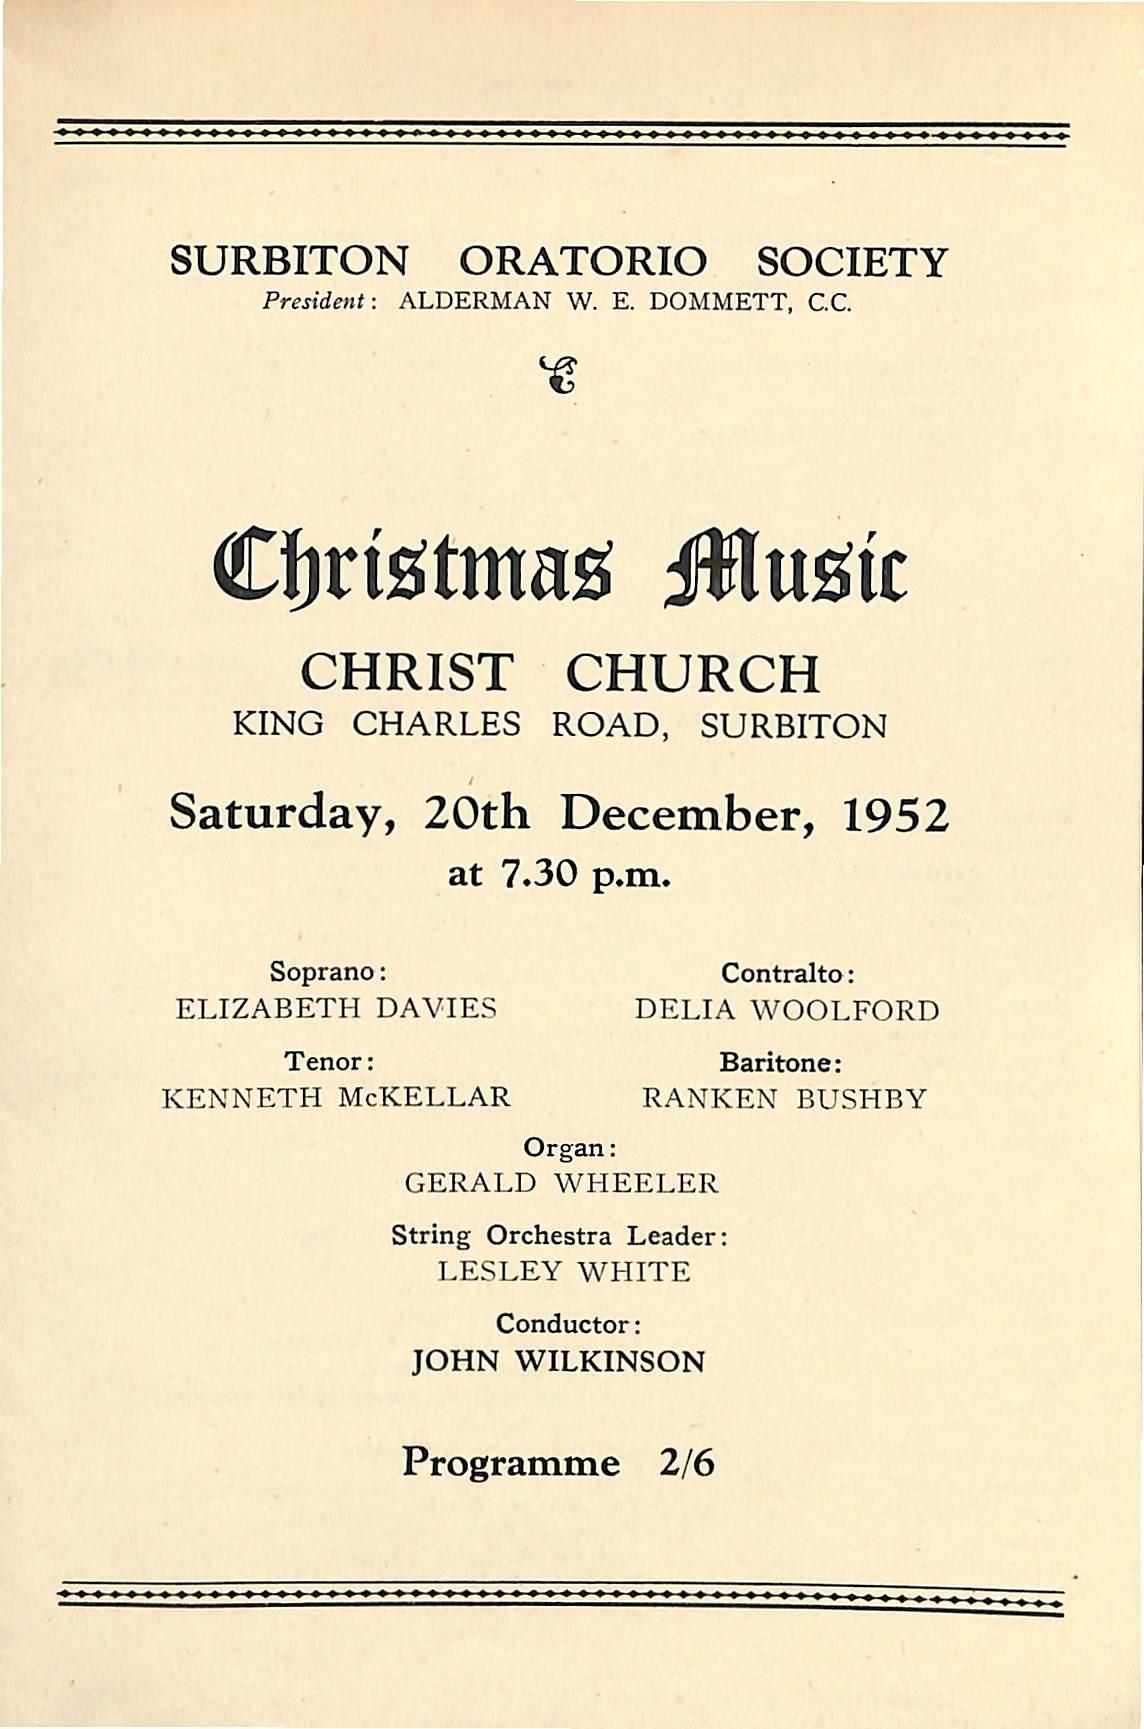 20 December 1952